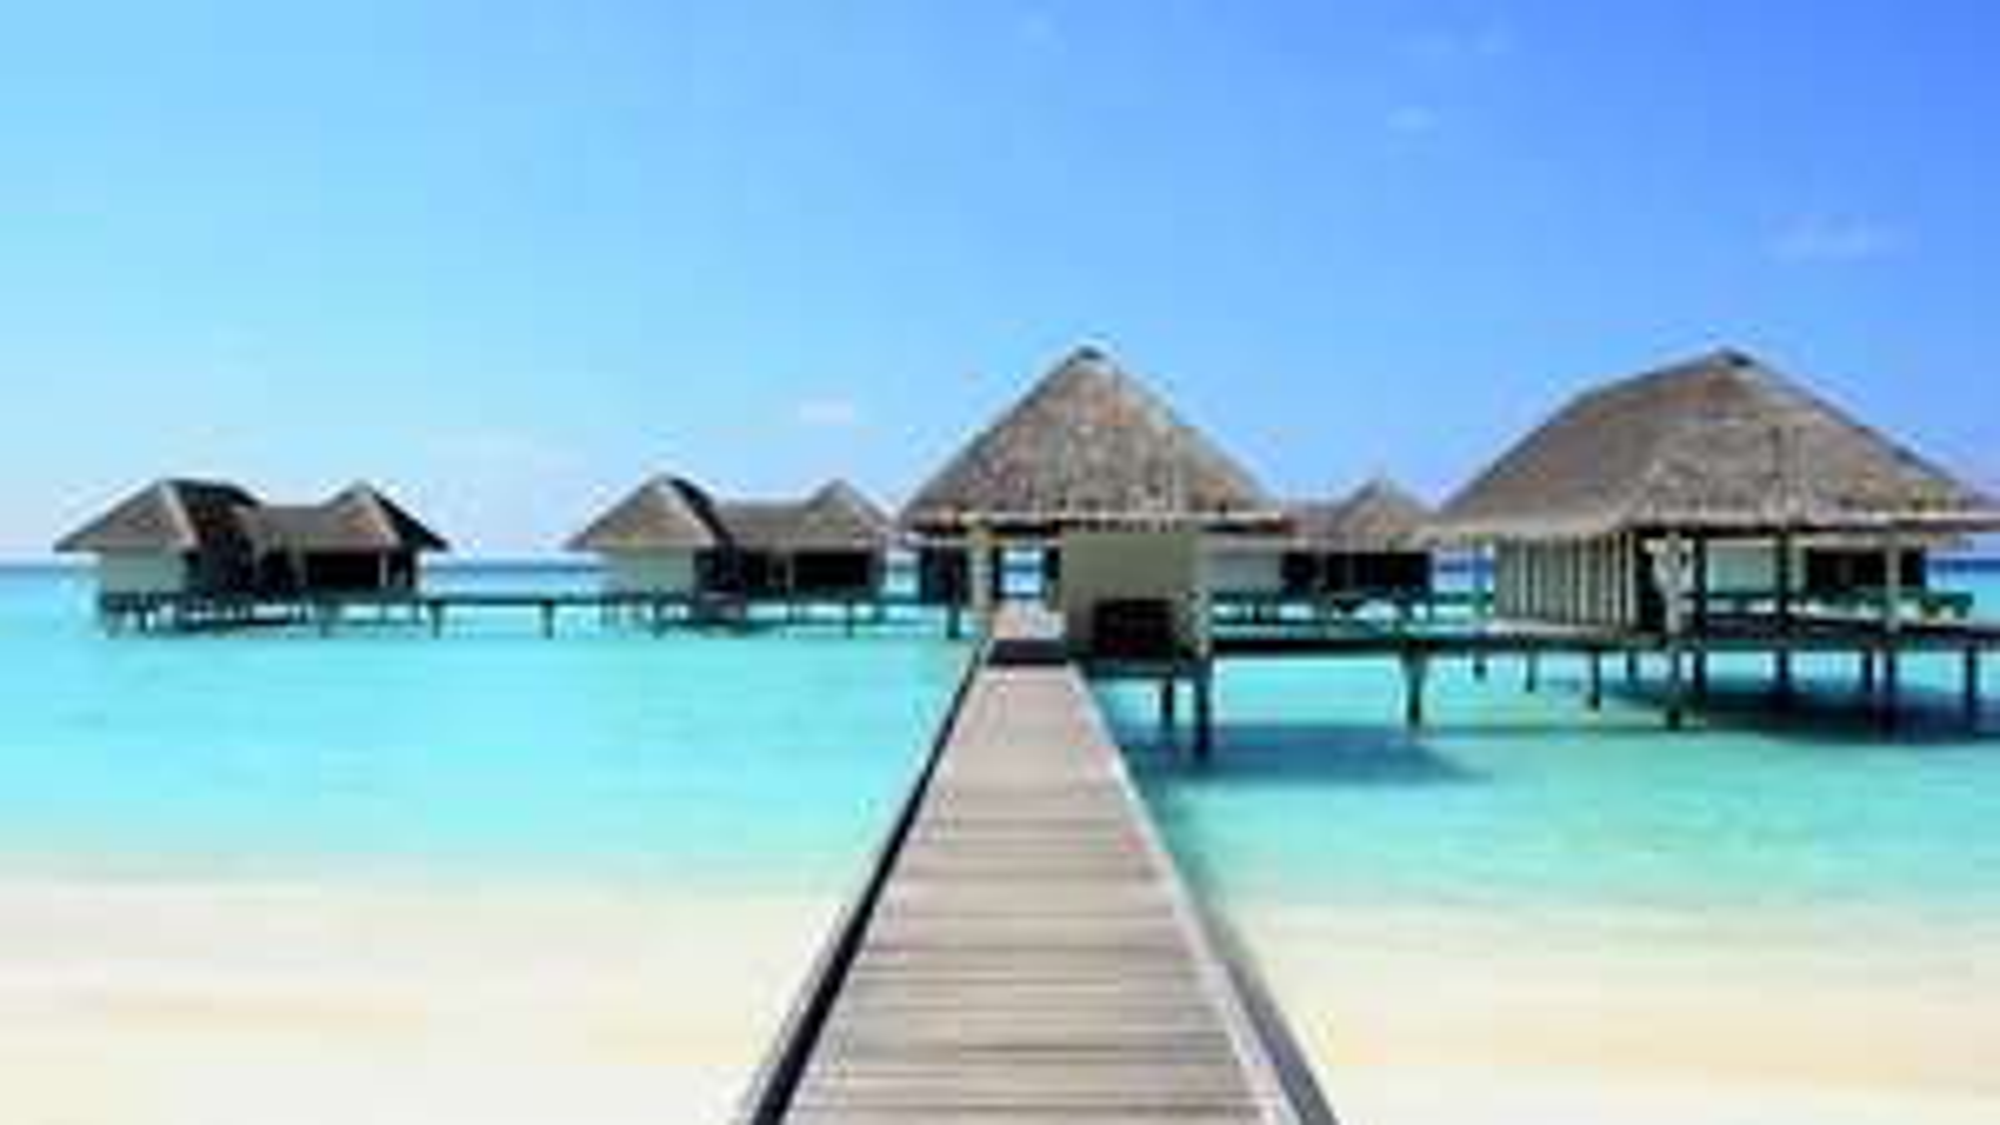 7 Tage Malediven mit Flug ab 1.263€ pro Person im 4,5* Hotel im Mai/ Juni